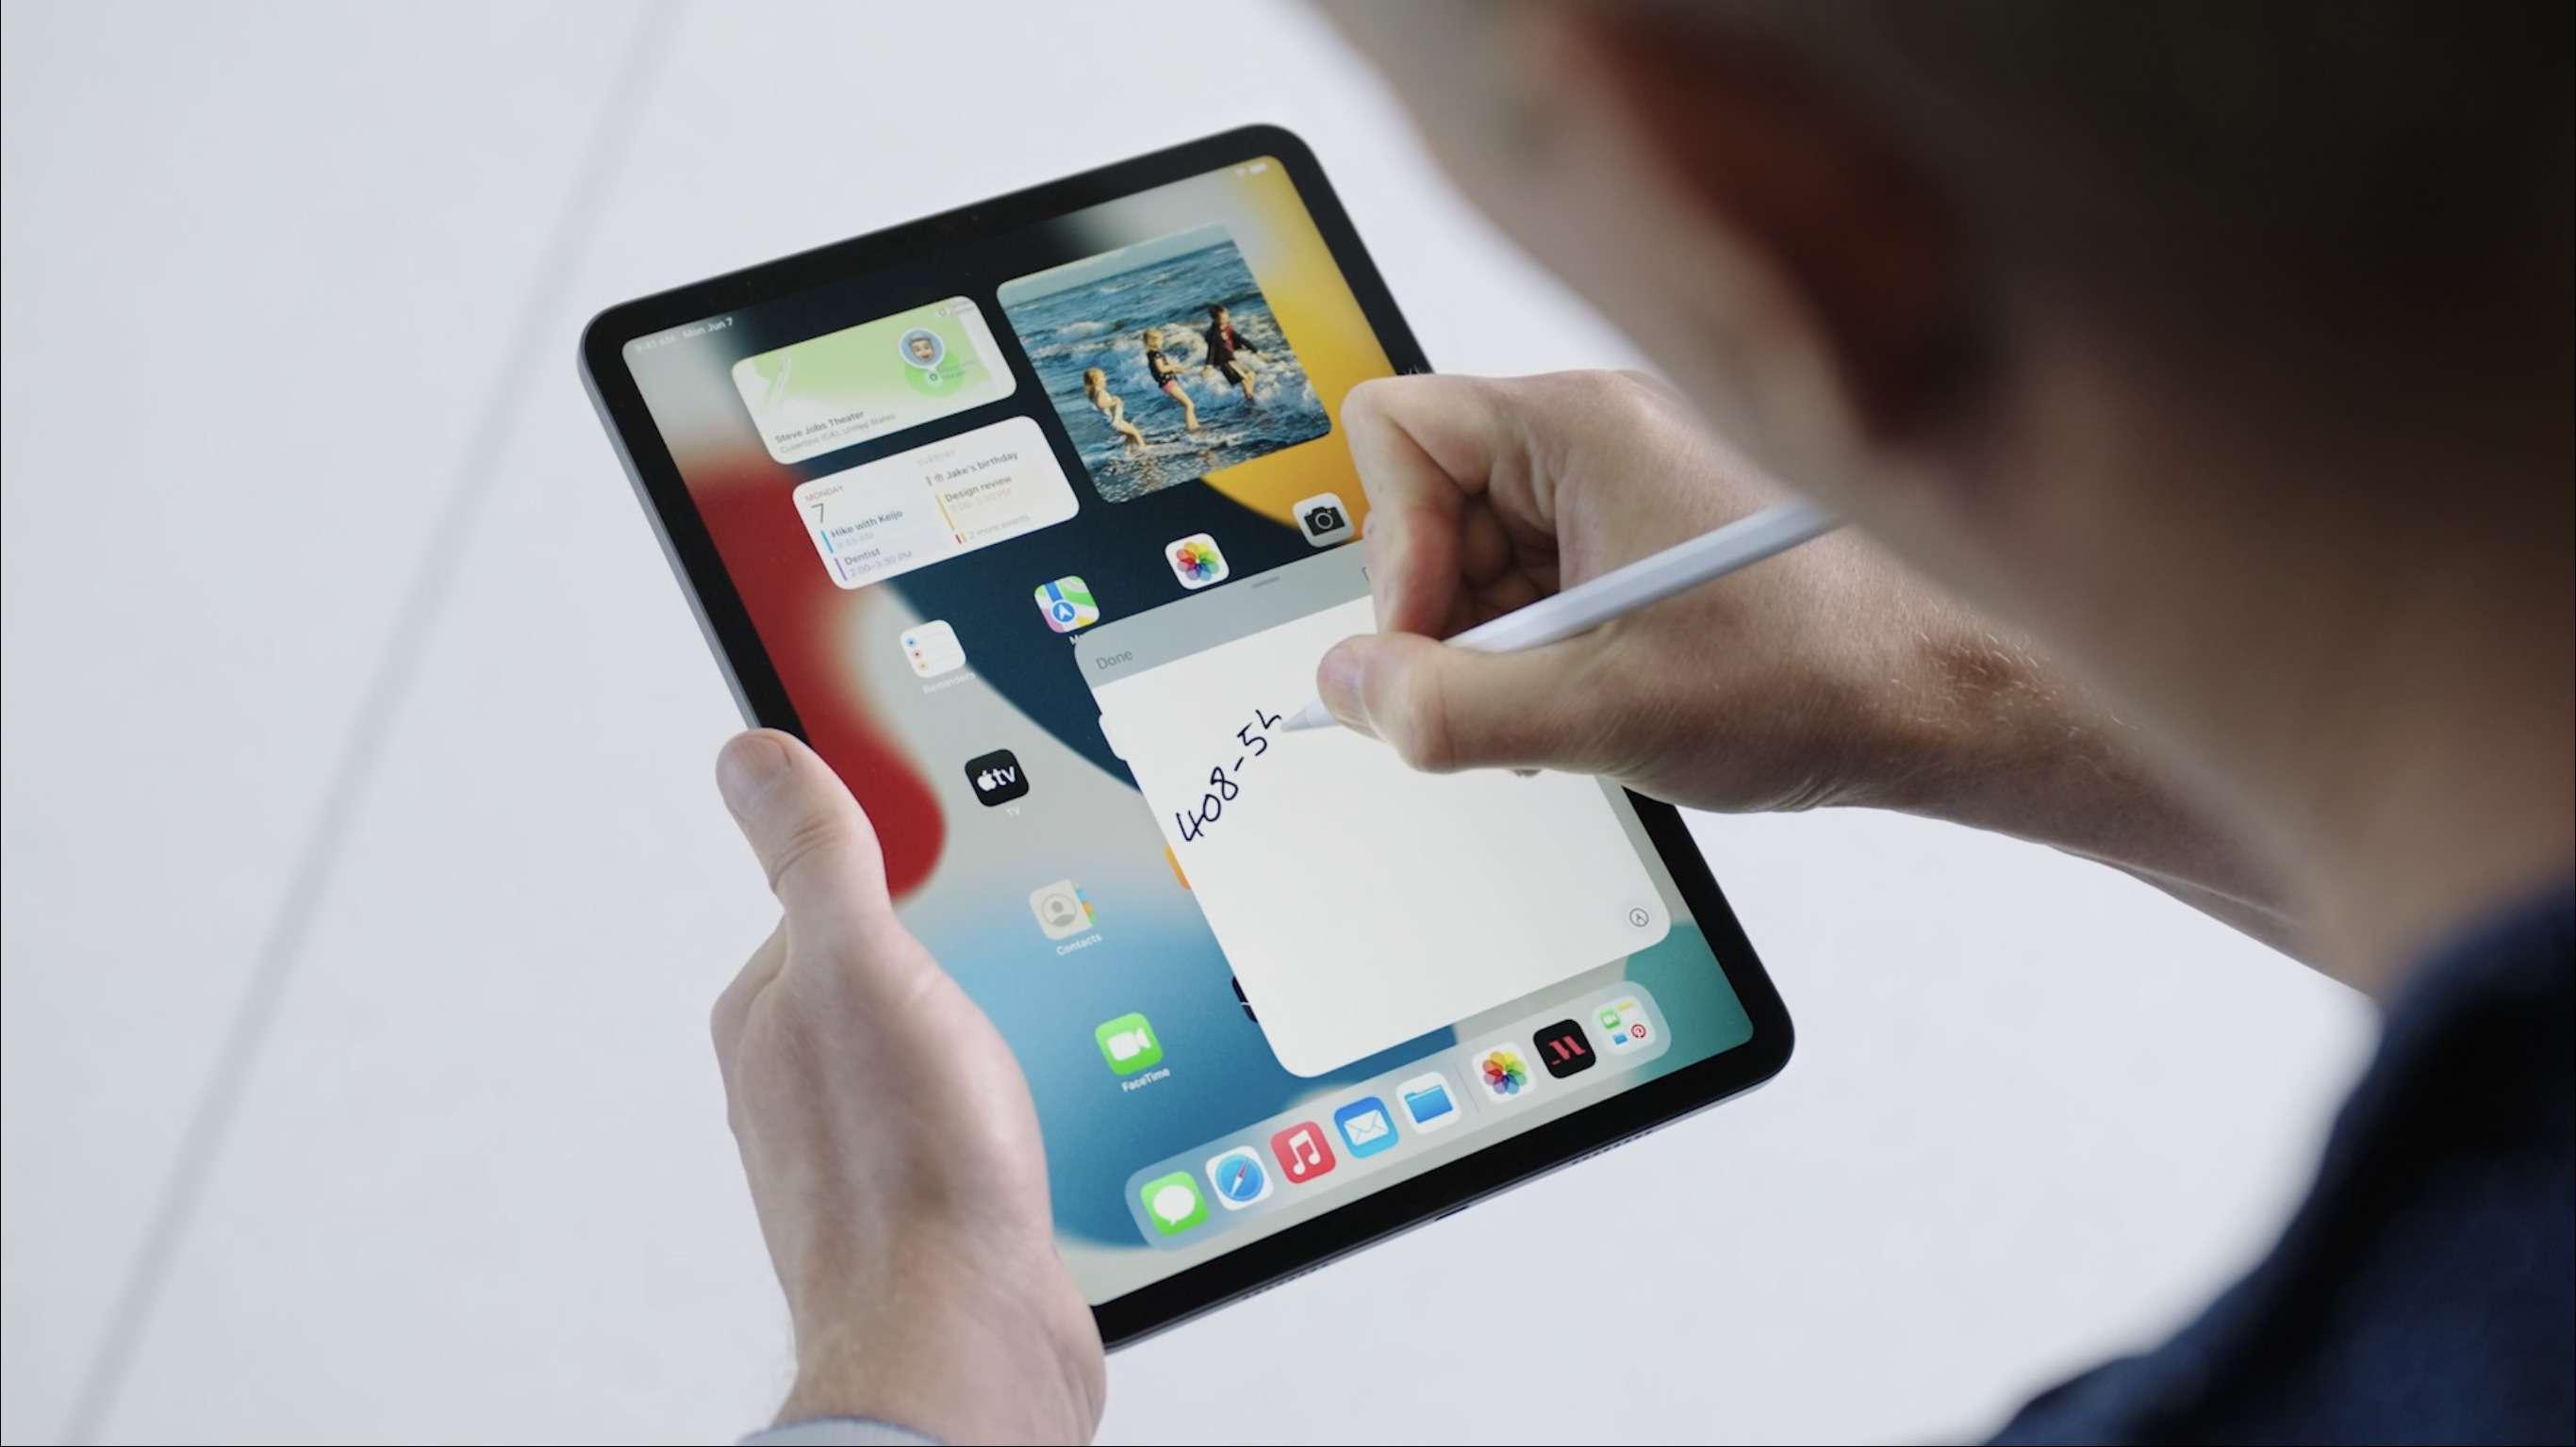 Someone takes notes on iPadOS 15